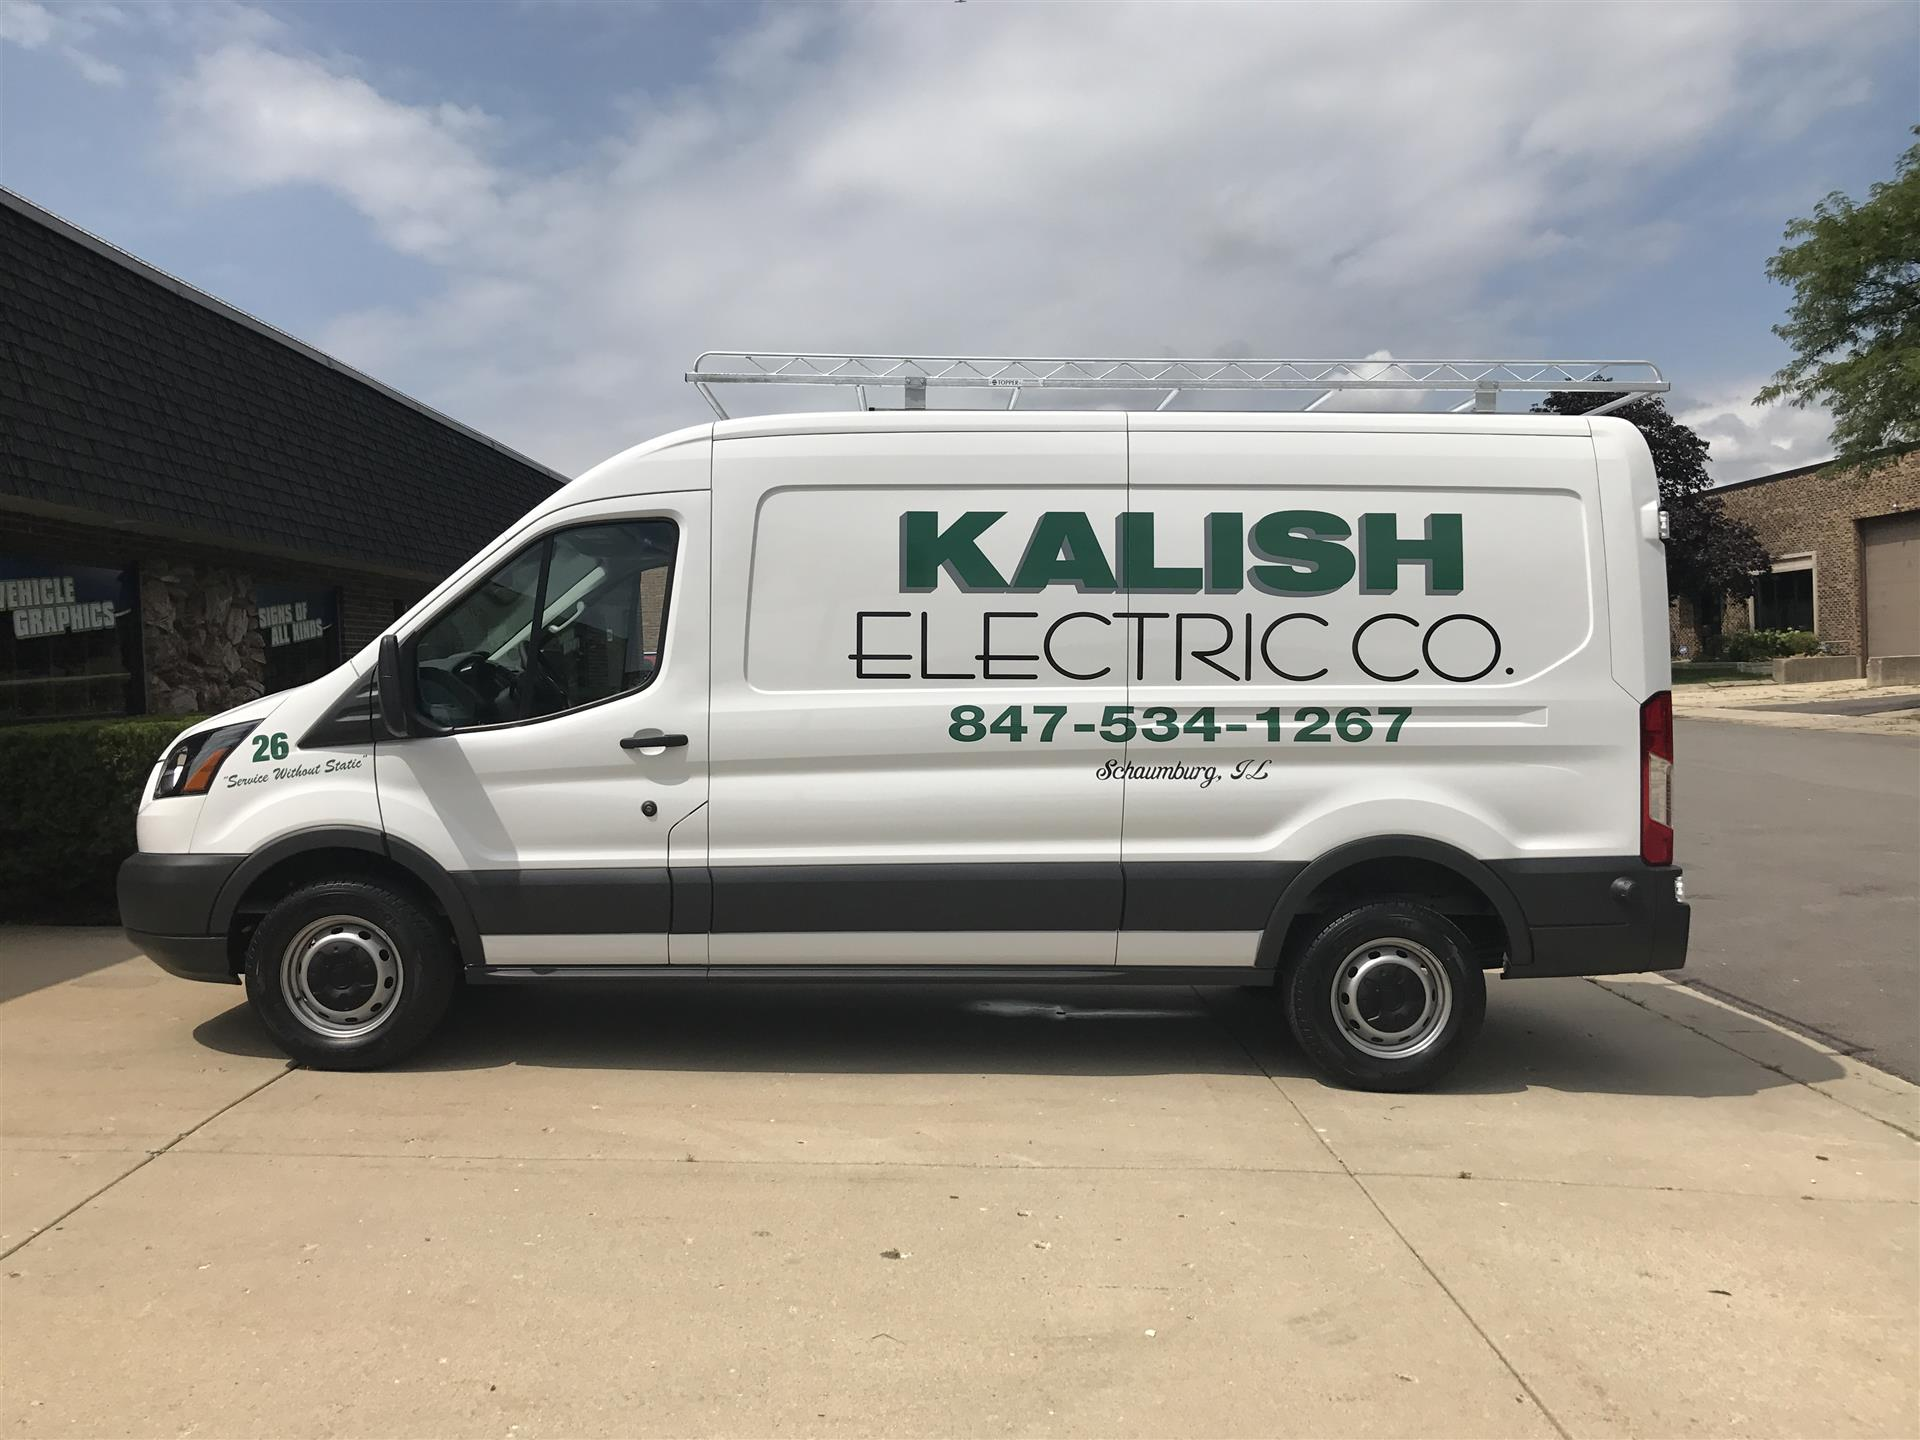 Kalish Electric Co. Vehicle Wrap